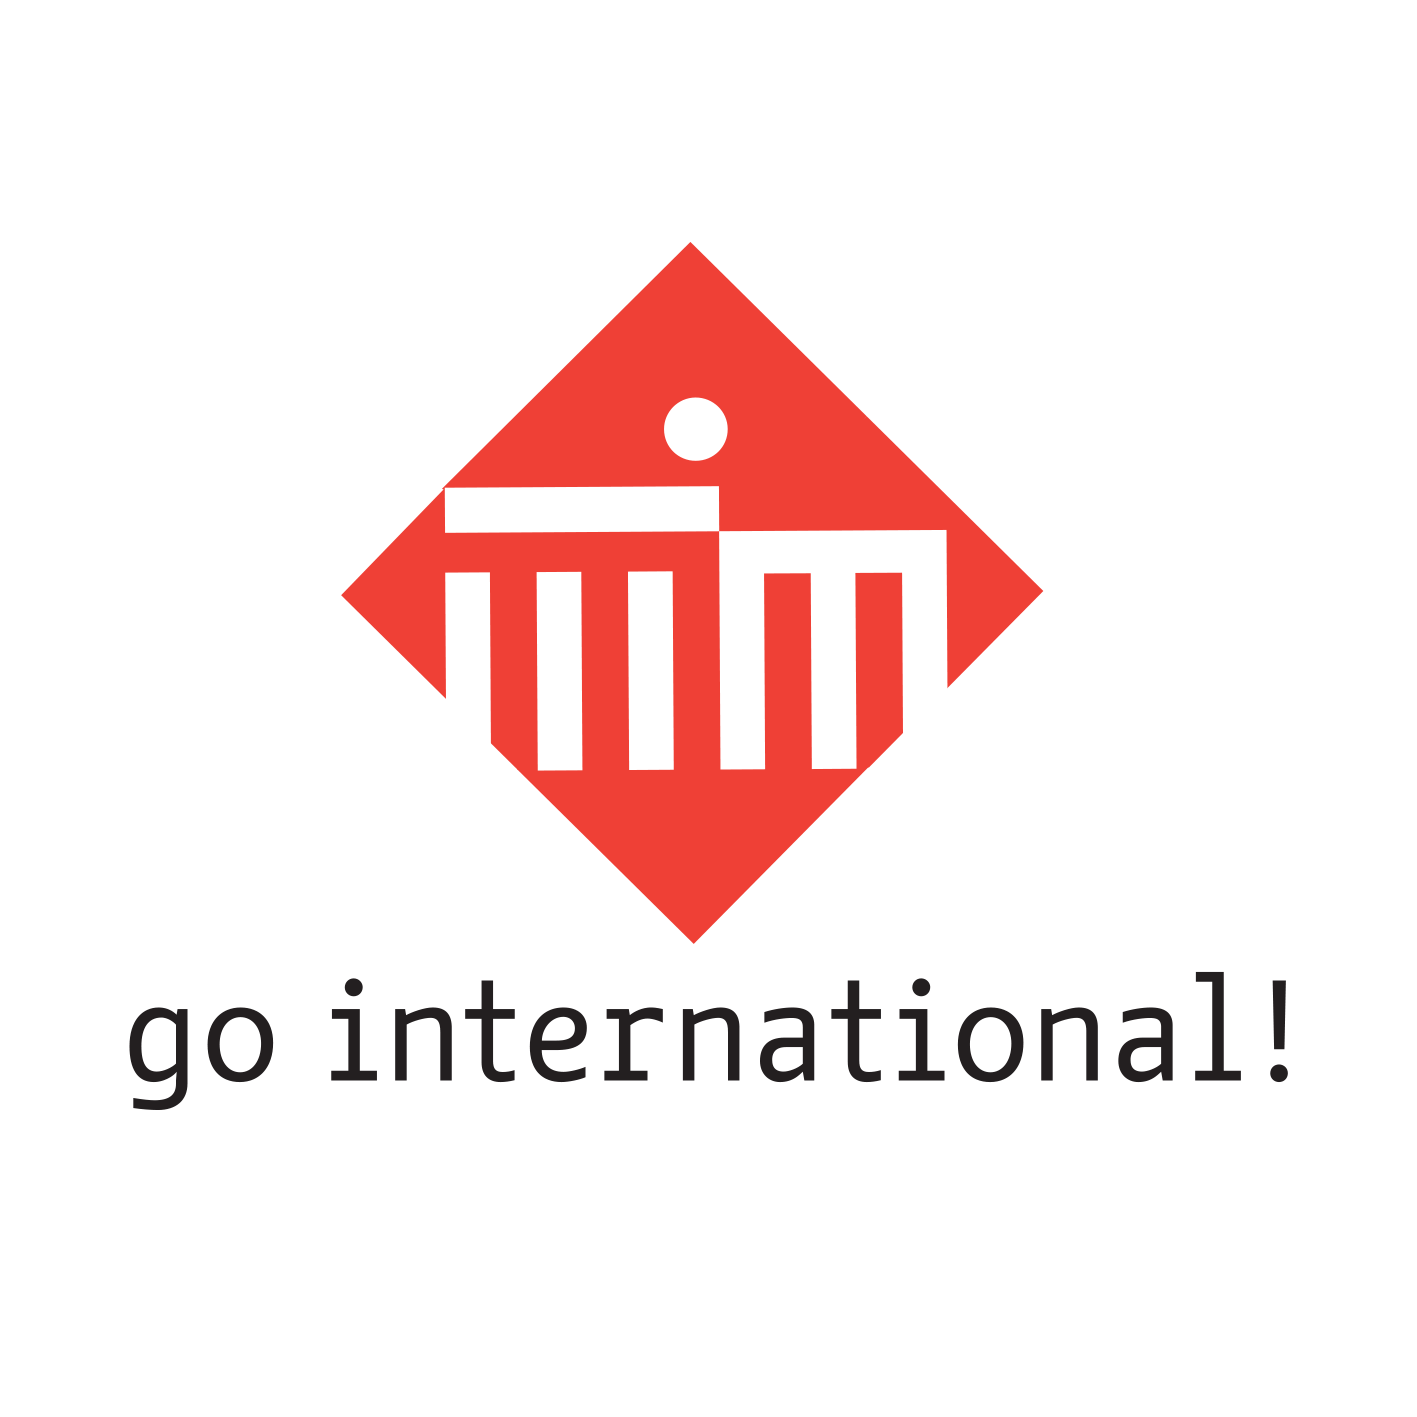 go international.png